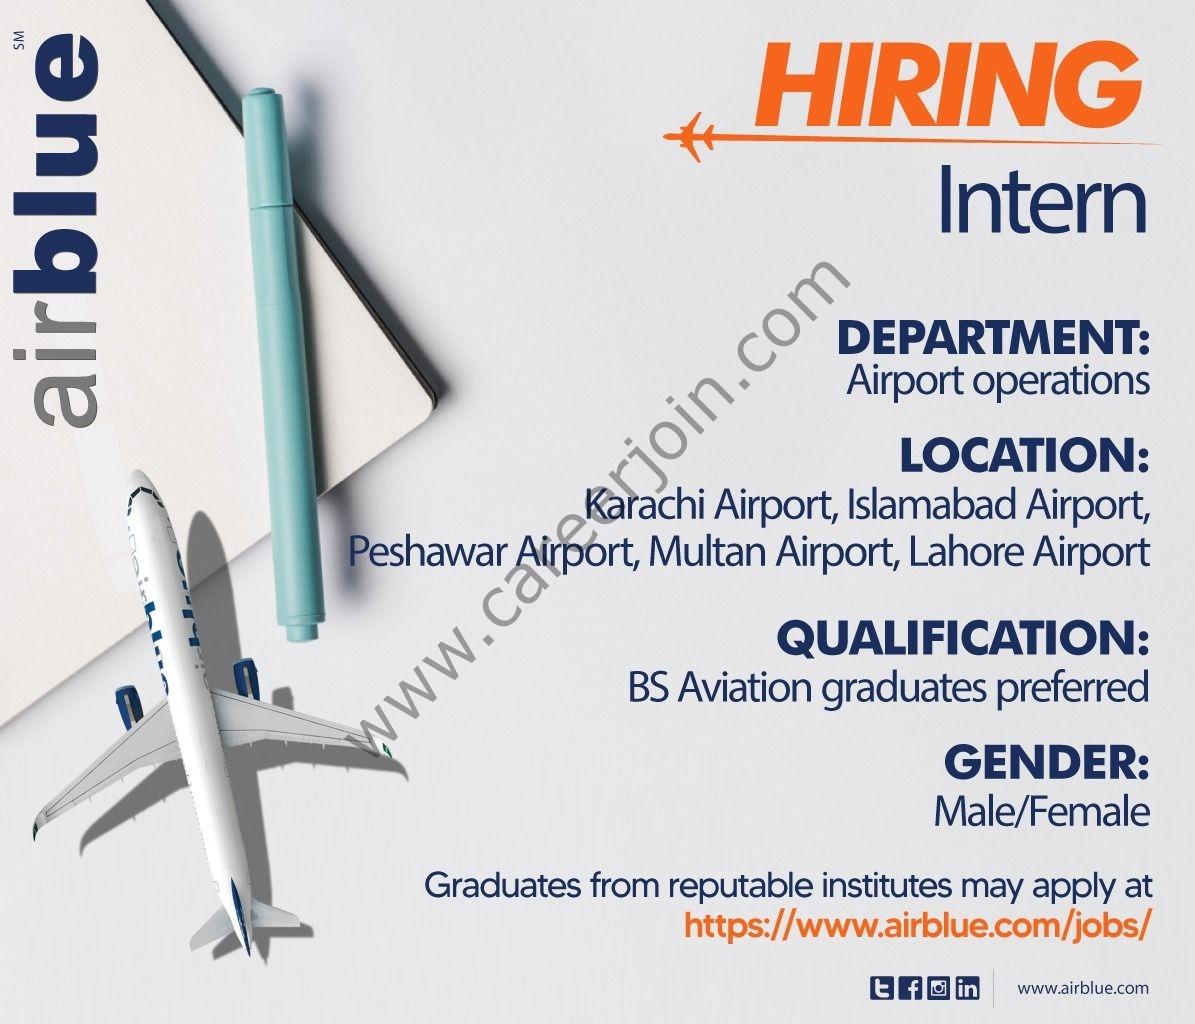 Airblue Pakistan Internship September 2021